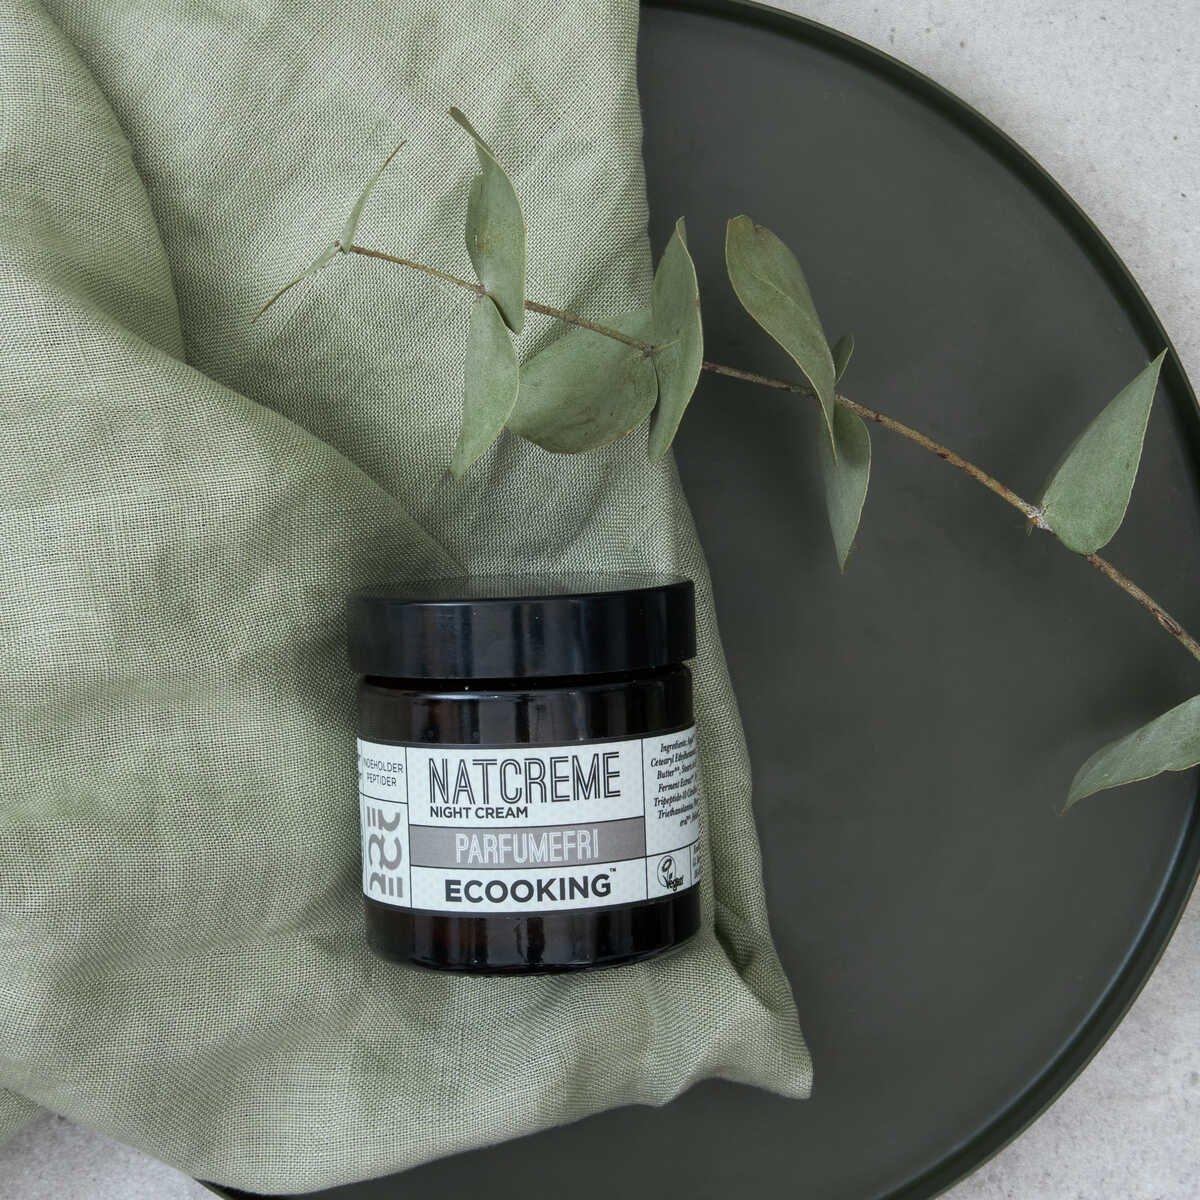 Natcreme Parfumefri 50 ml